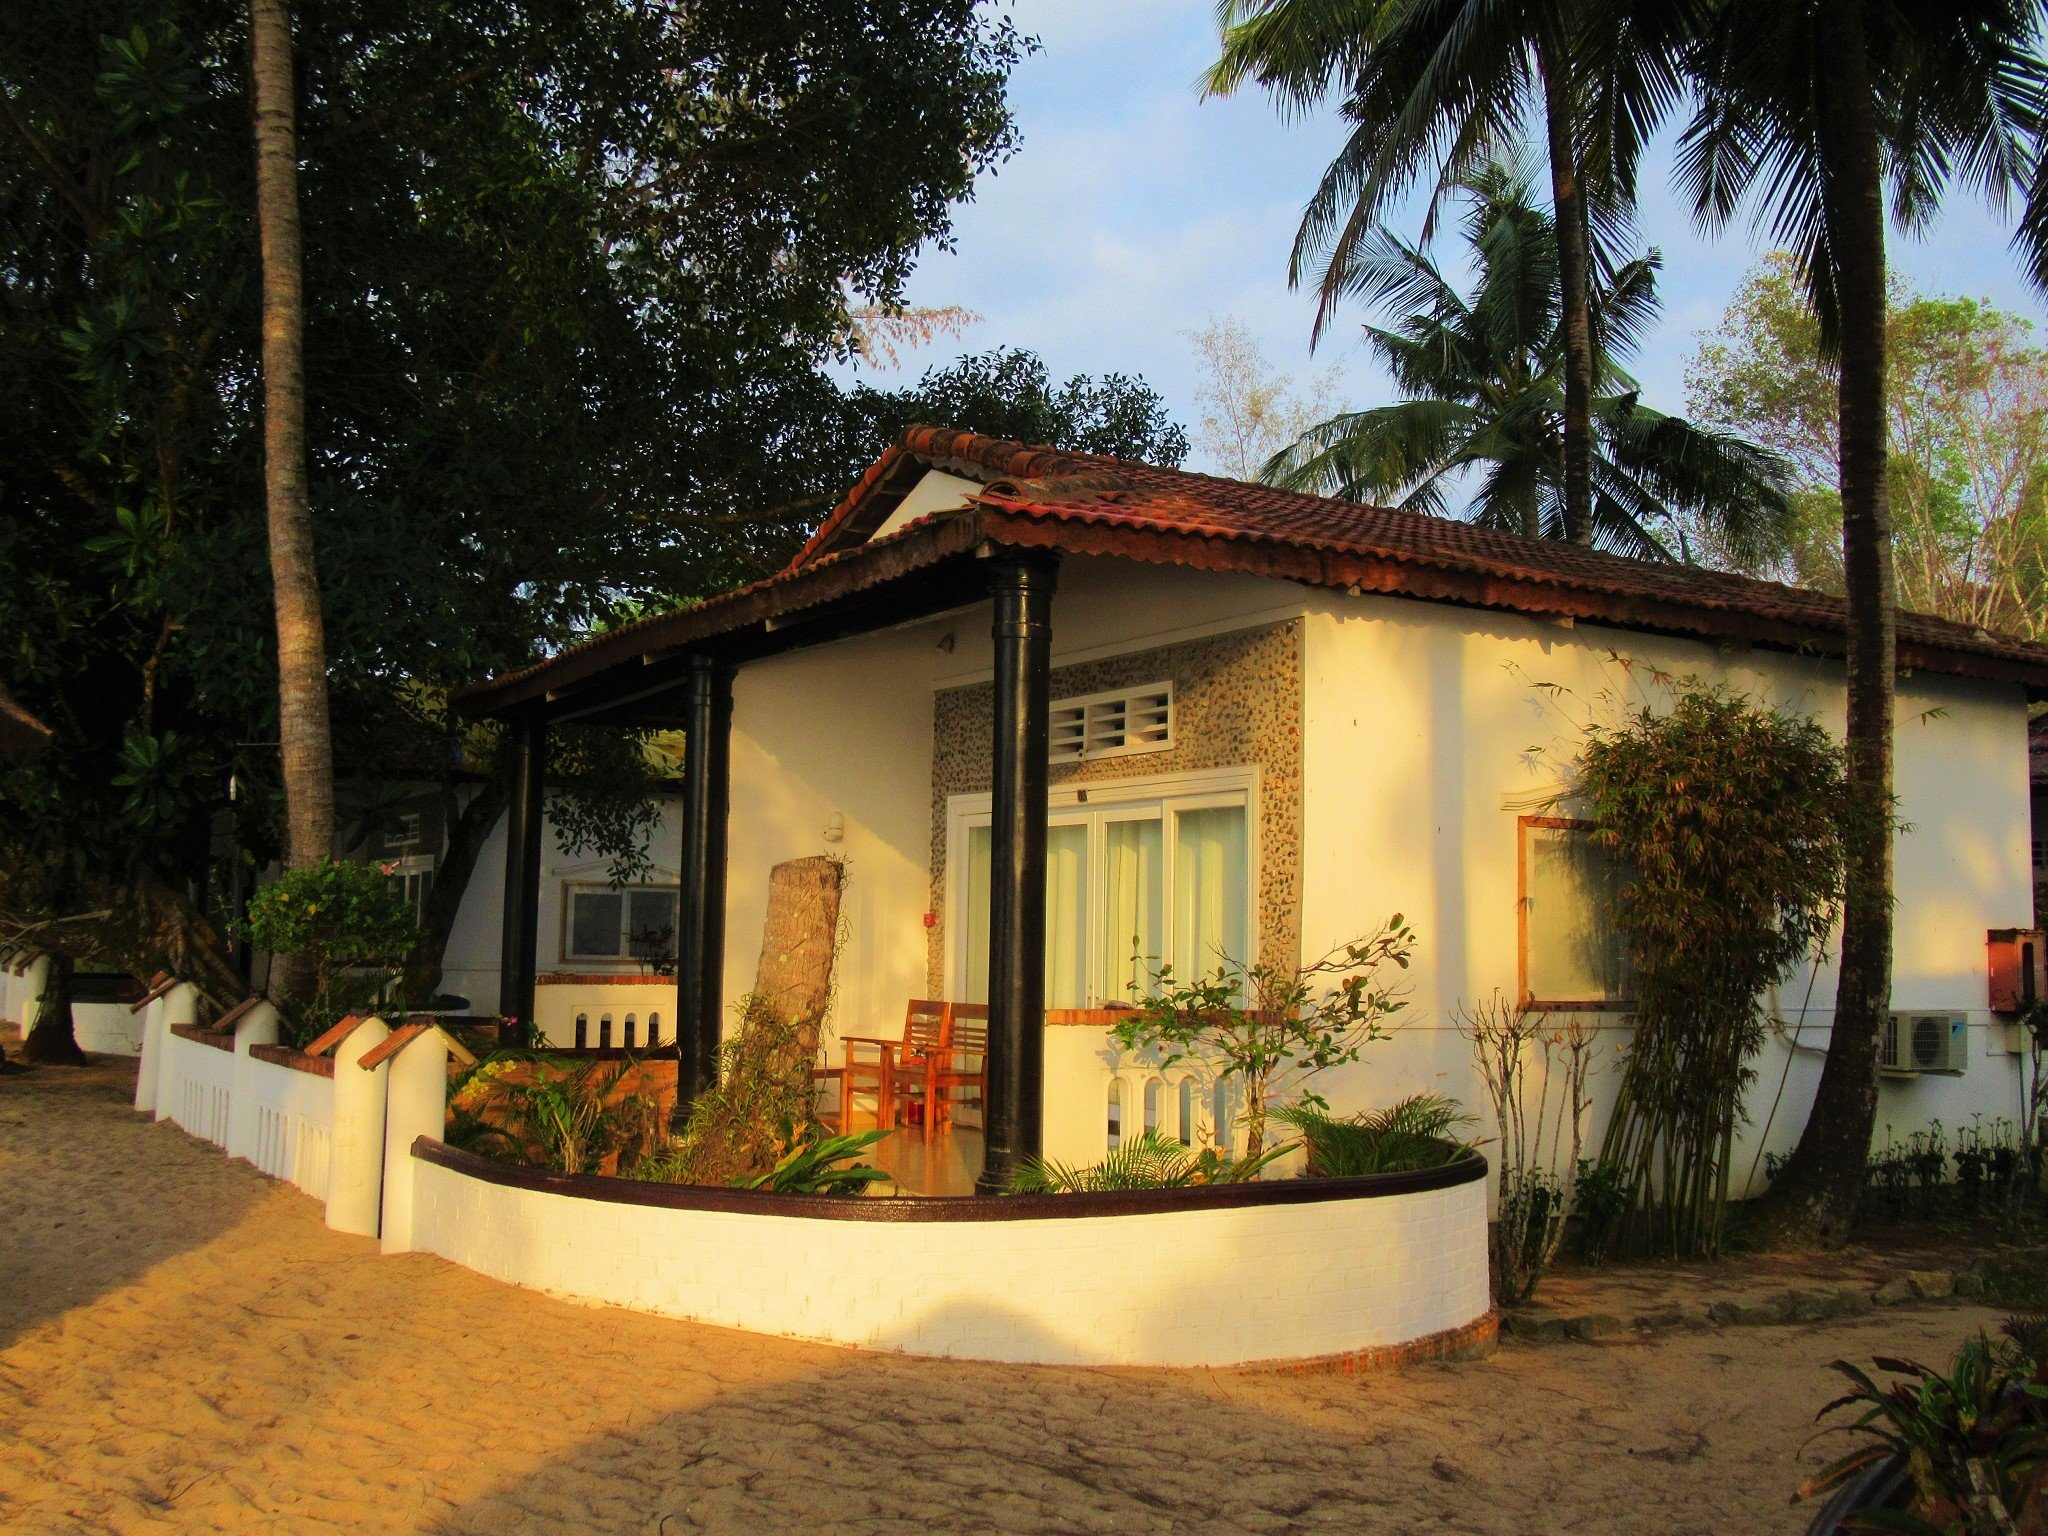 Bamboo Cottages, Solar-powered beach resort, Phu Quoc Island, Vietnam